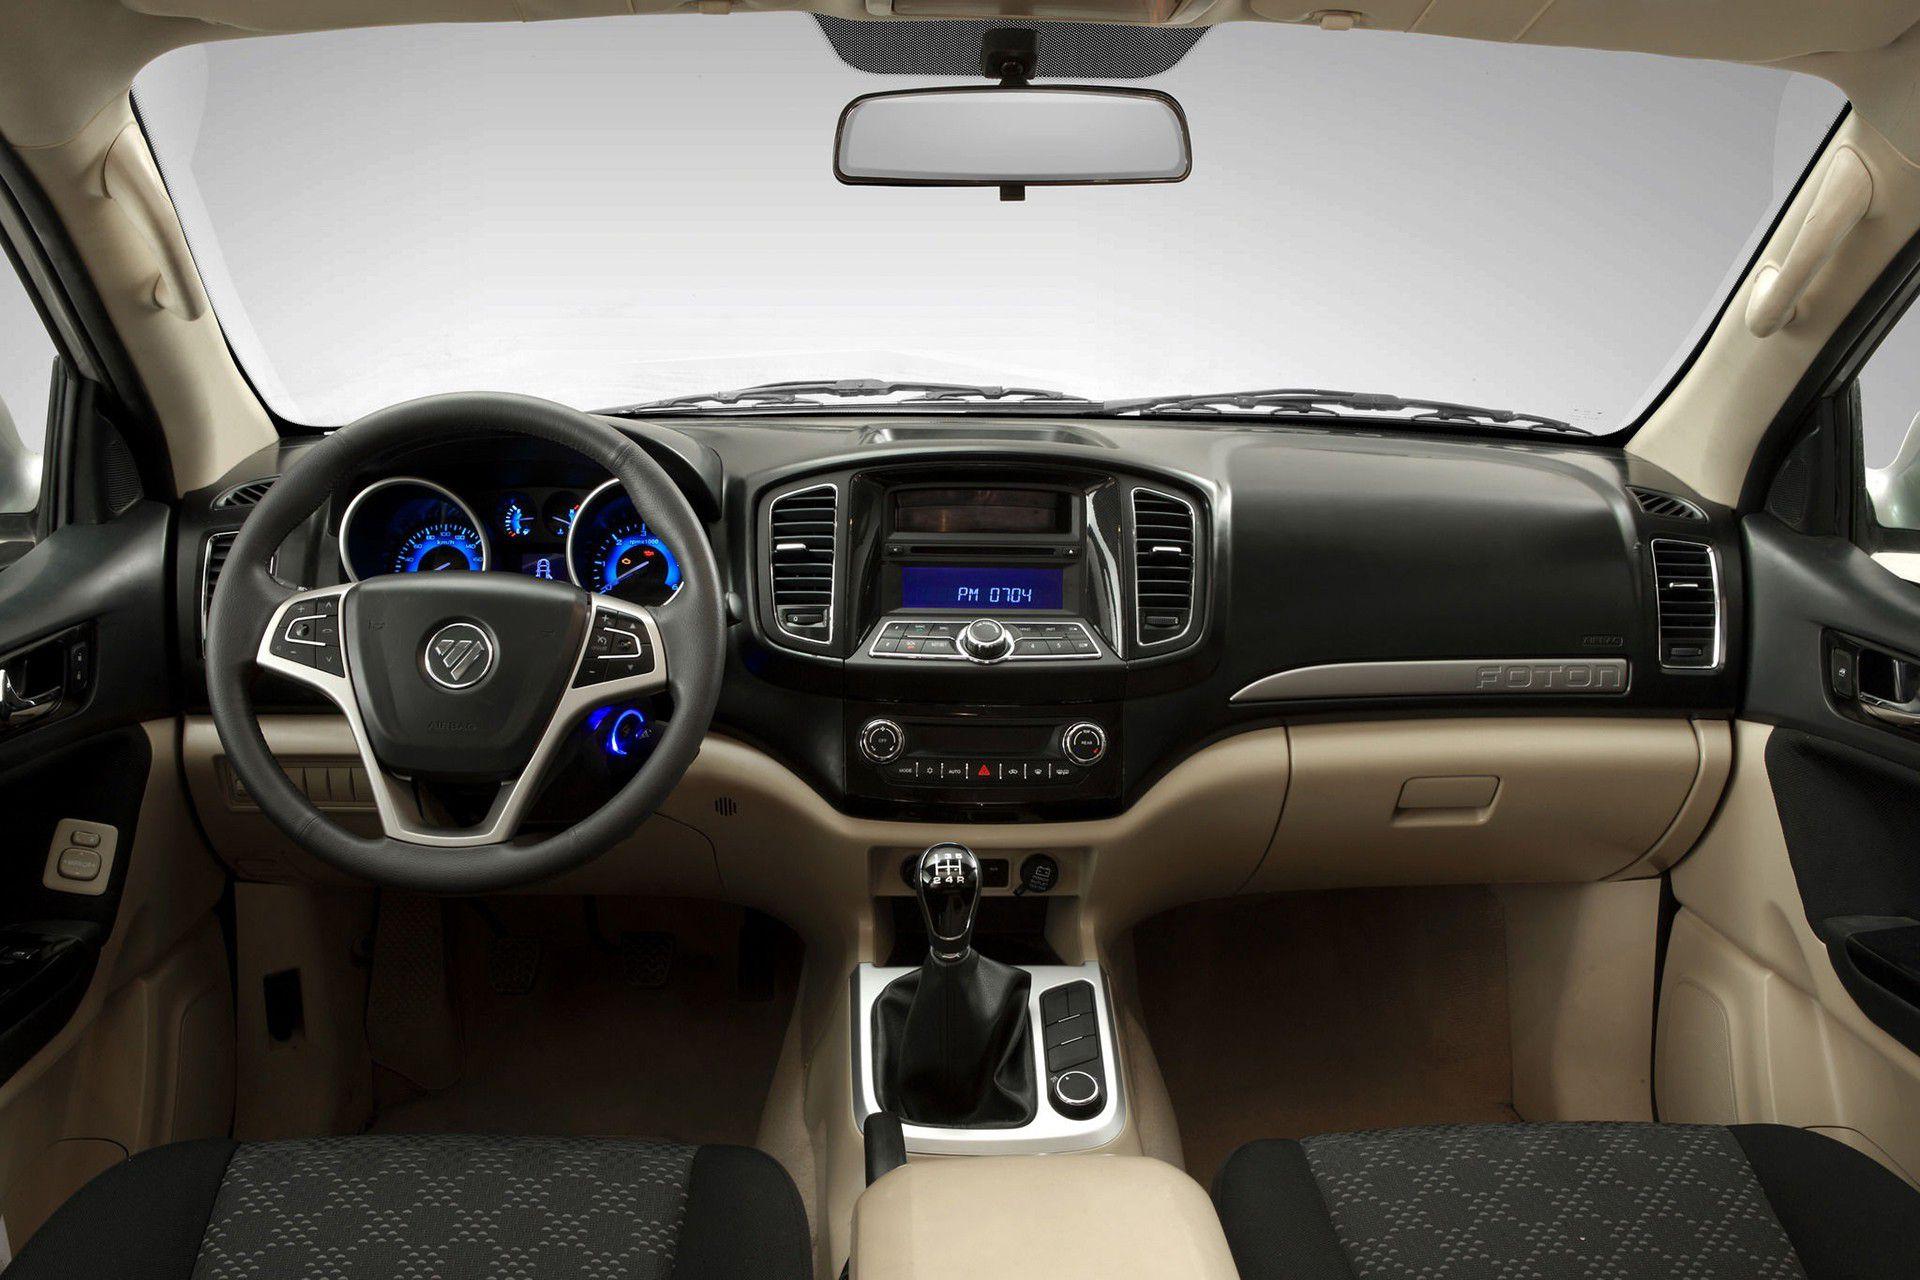 فوتون ساوانای قدرتمند گران ترین خودروی چینی بازار + ویدیو